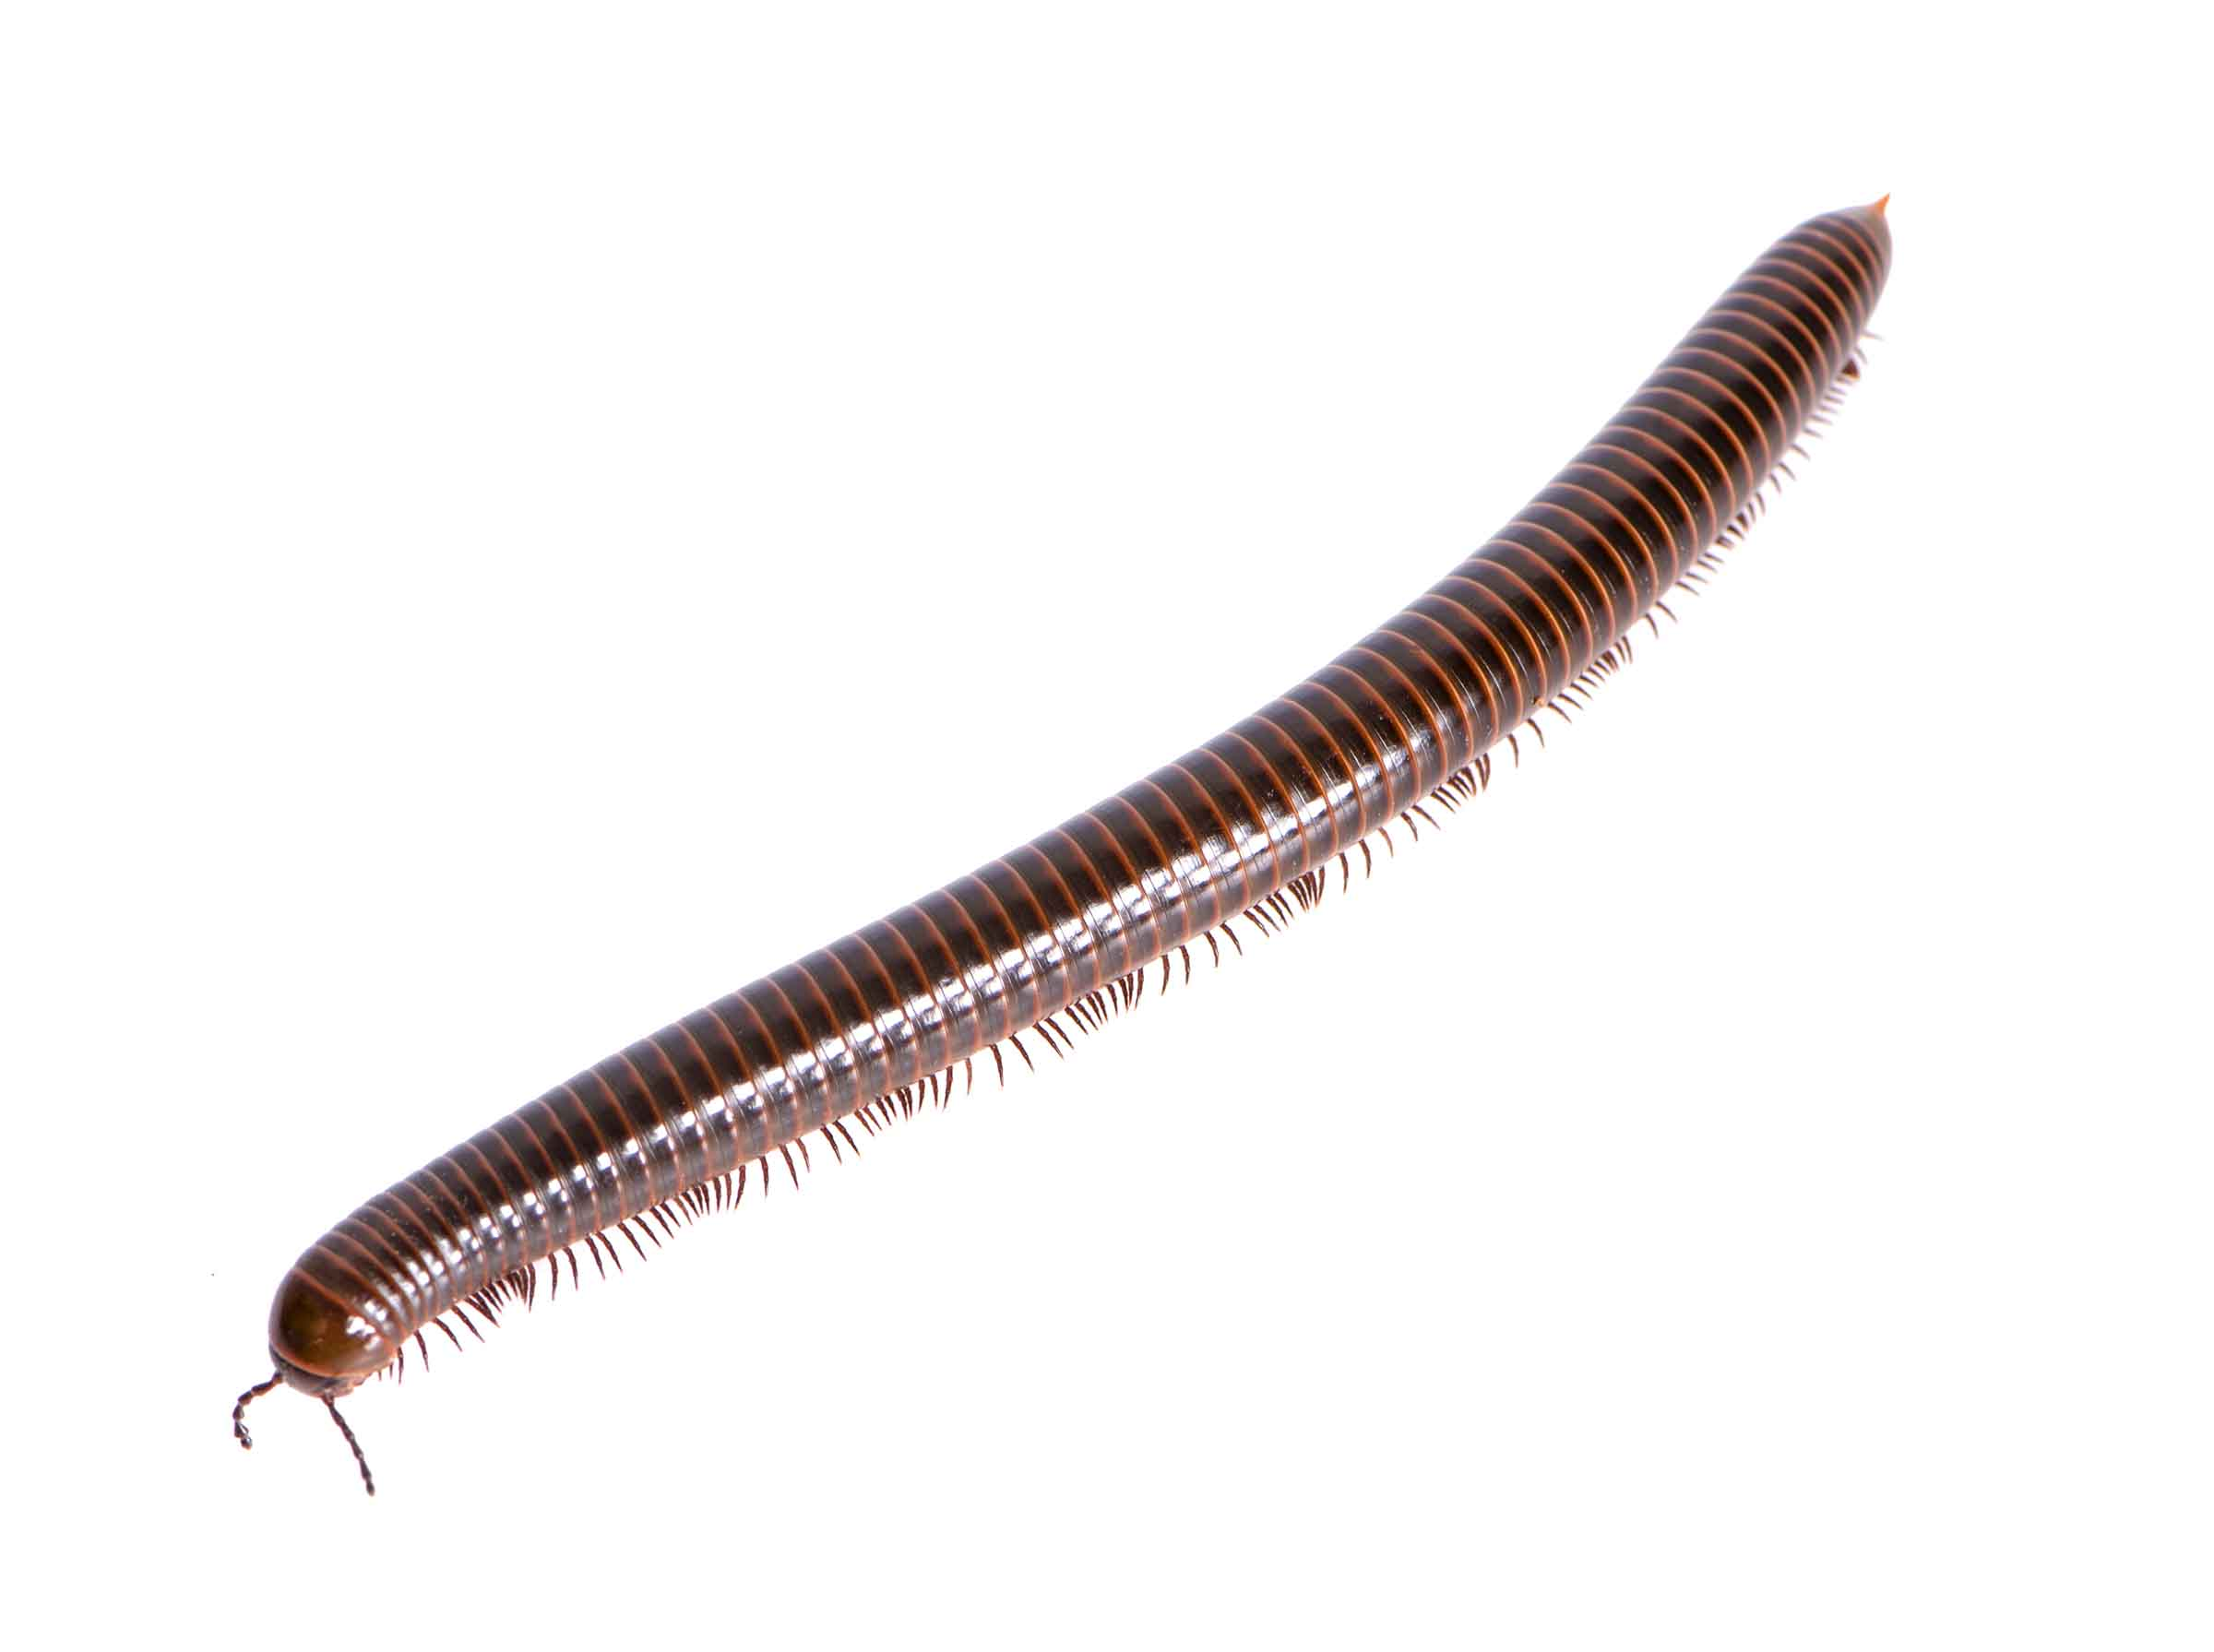 millipede on white background